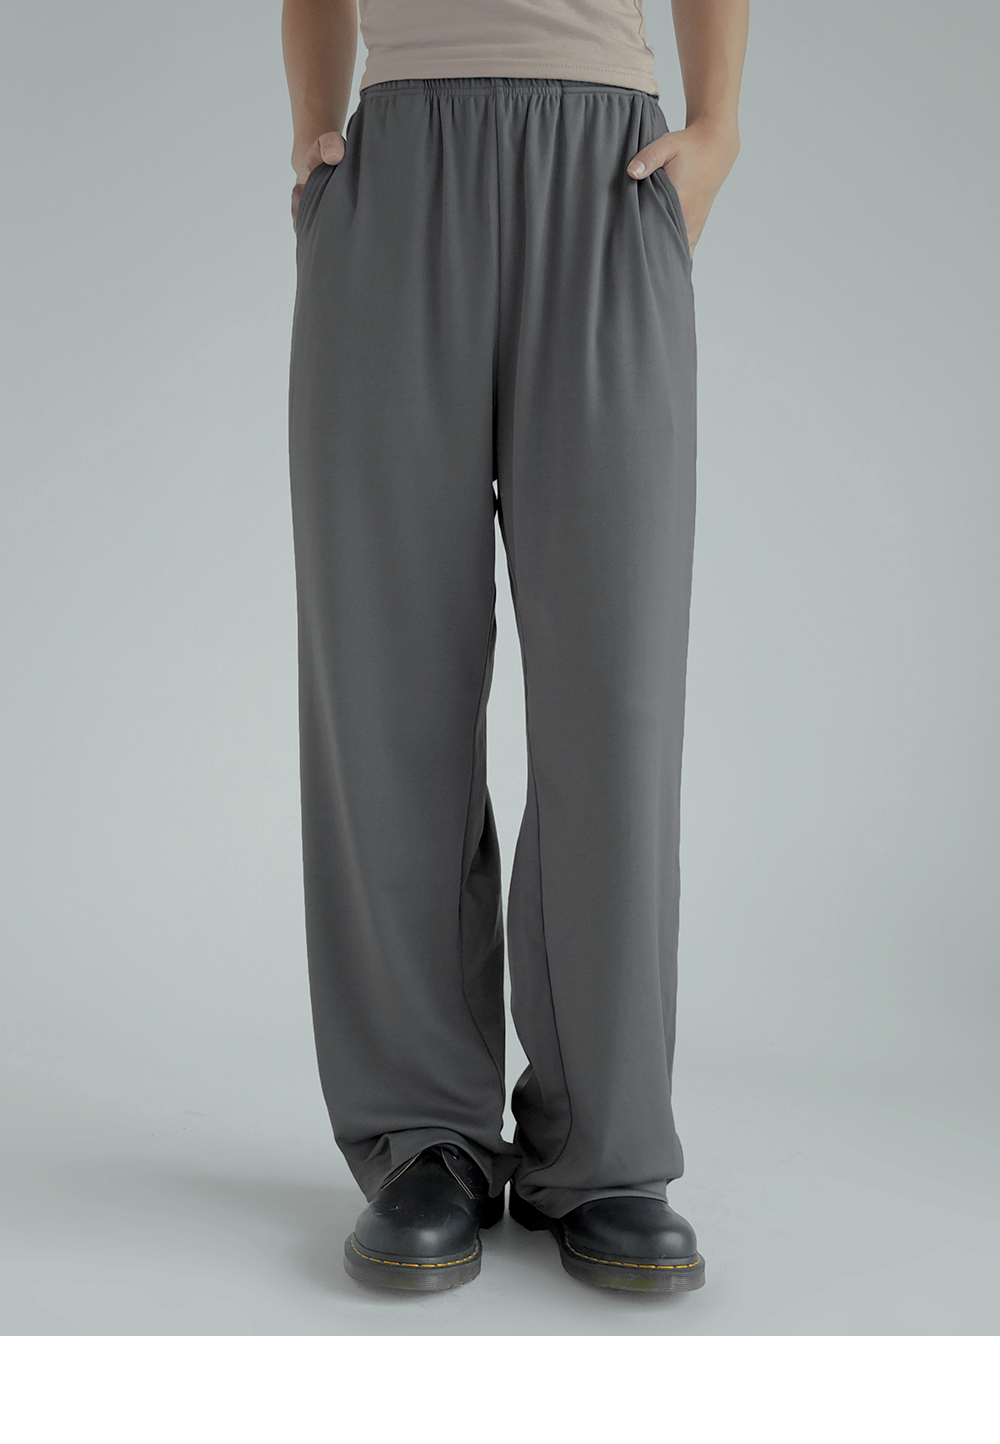 Jerry Summer Training Pants